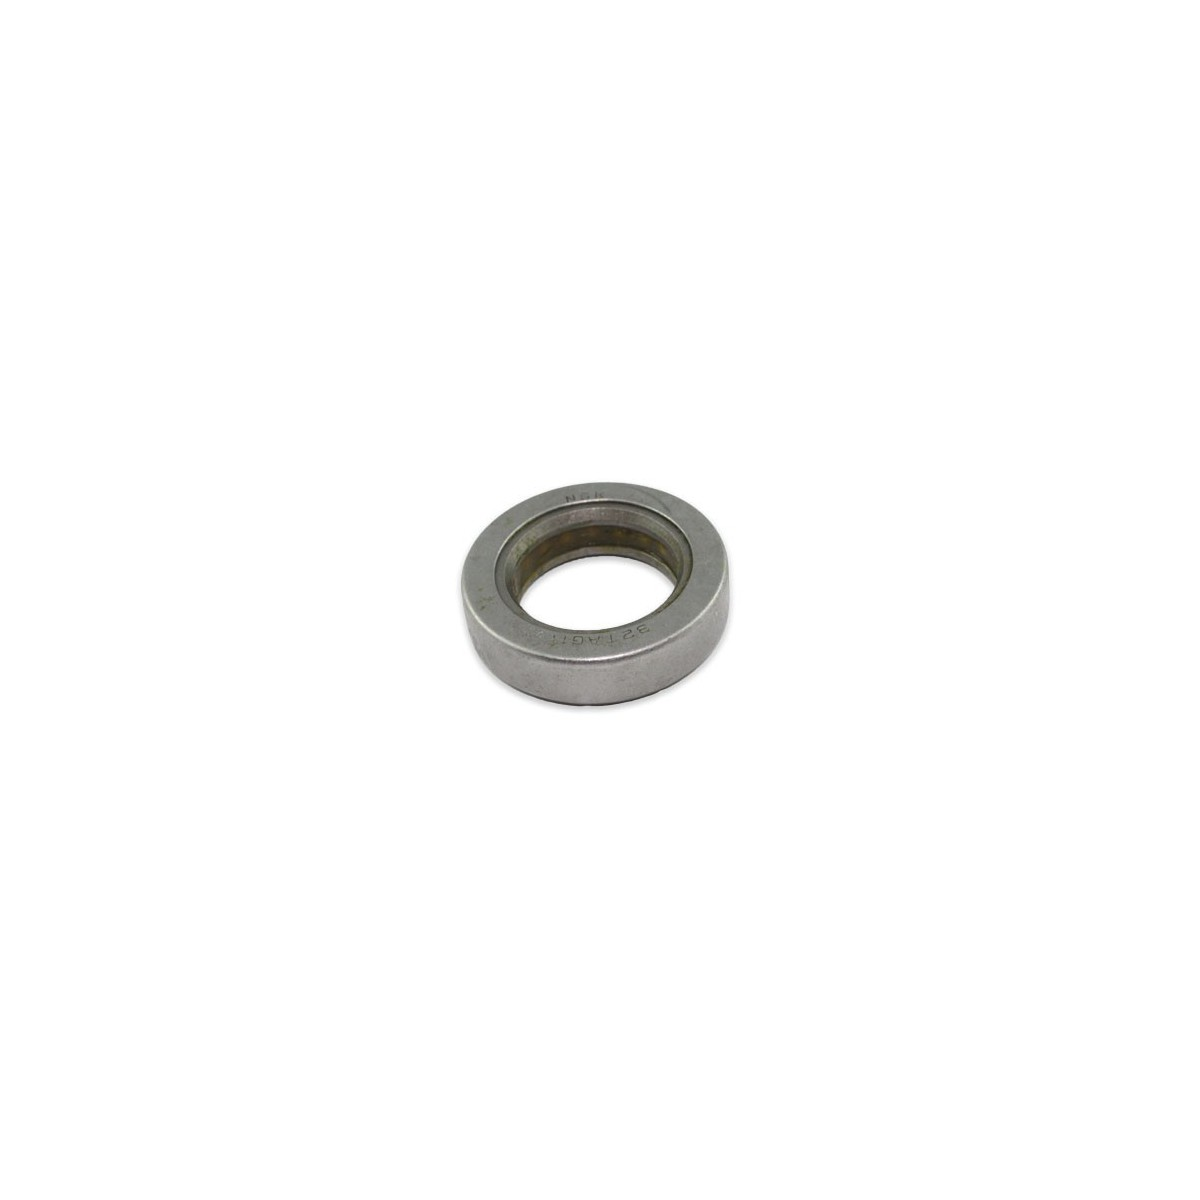 Thrust Bearing Small TS2205 52x32,2x13,6